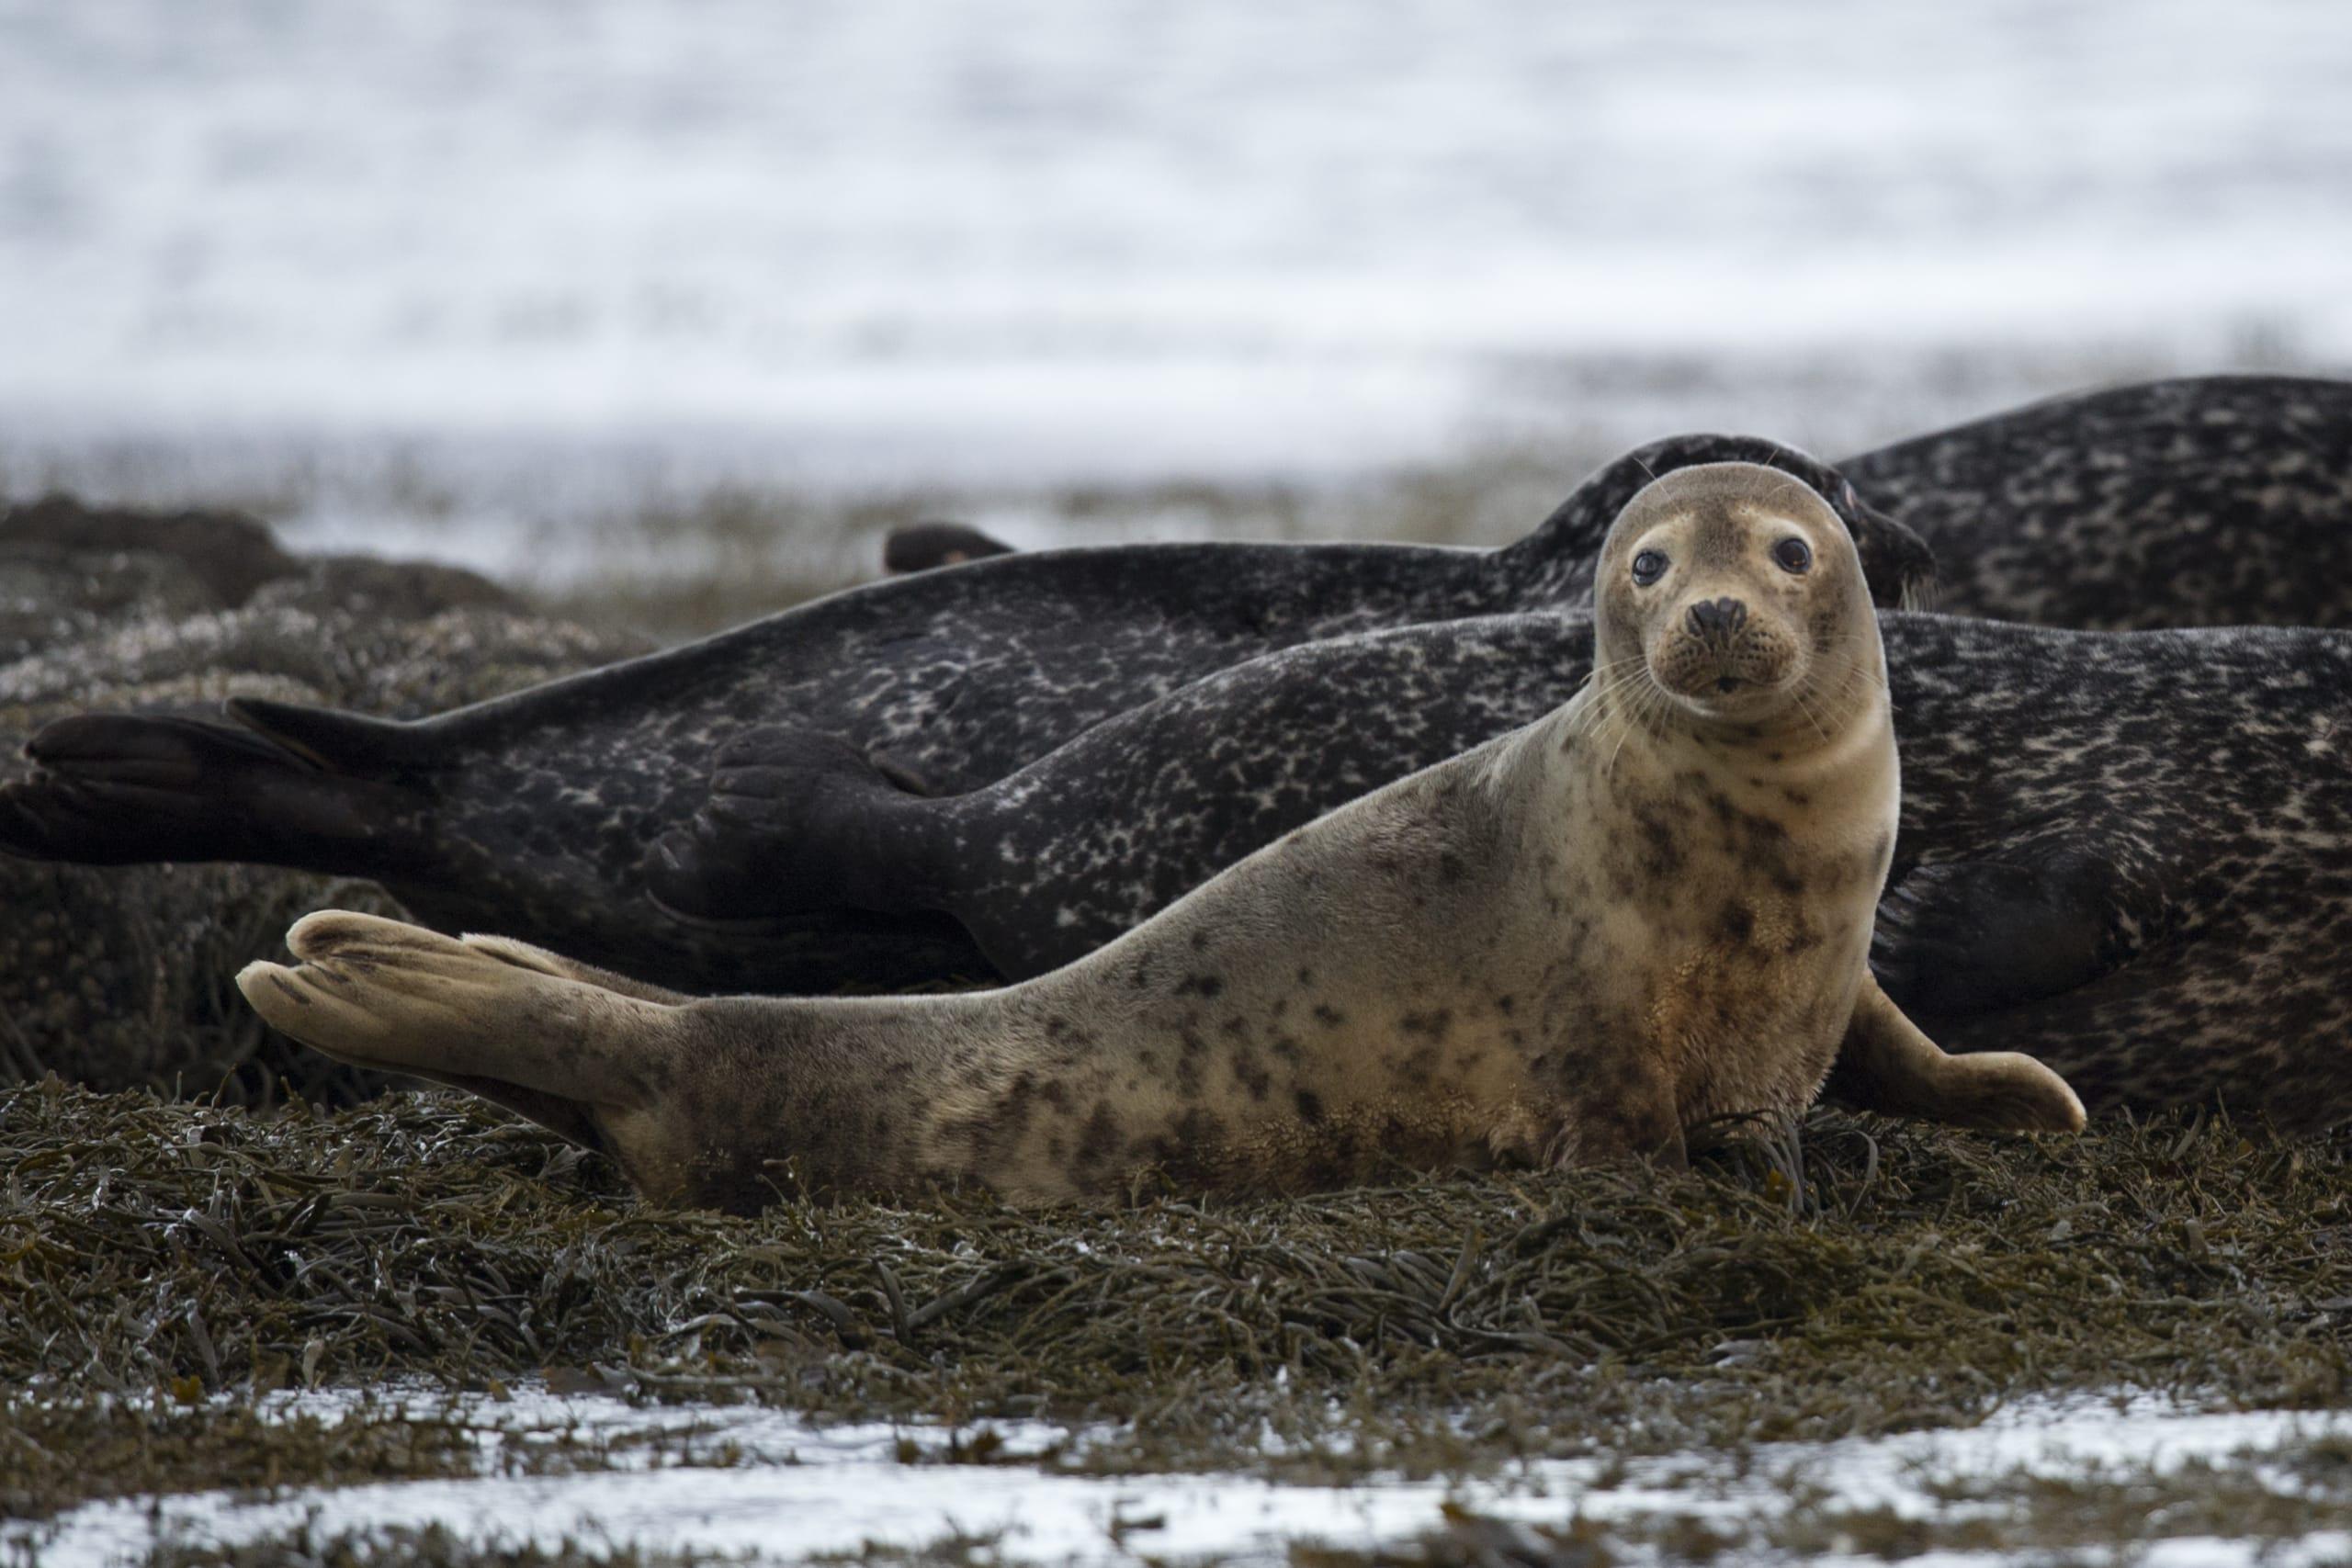 Norwegian grey seal having a good time